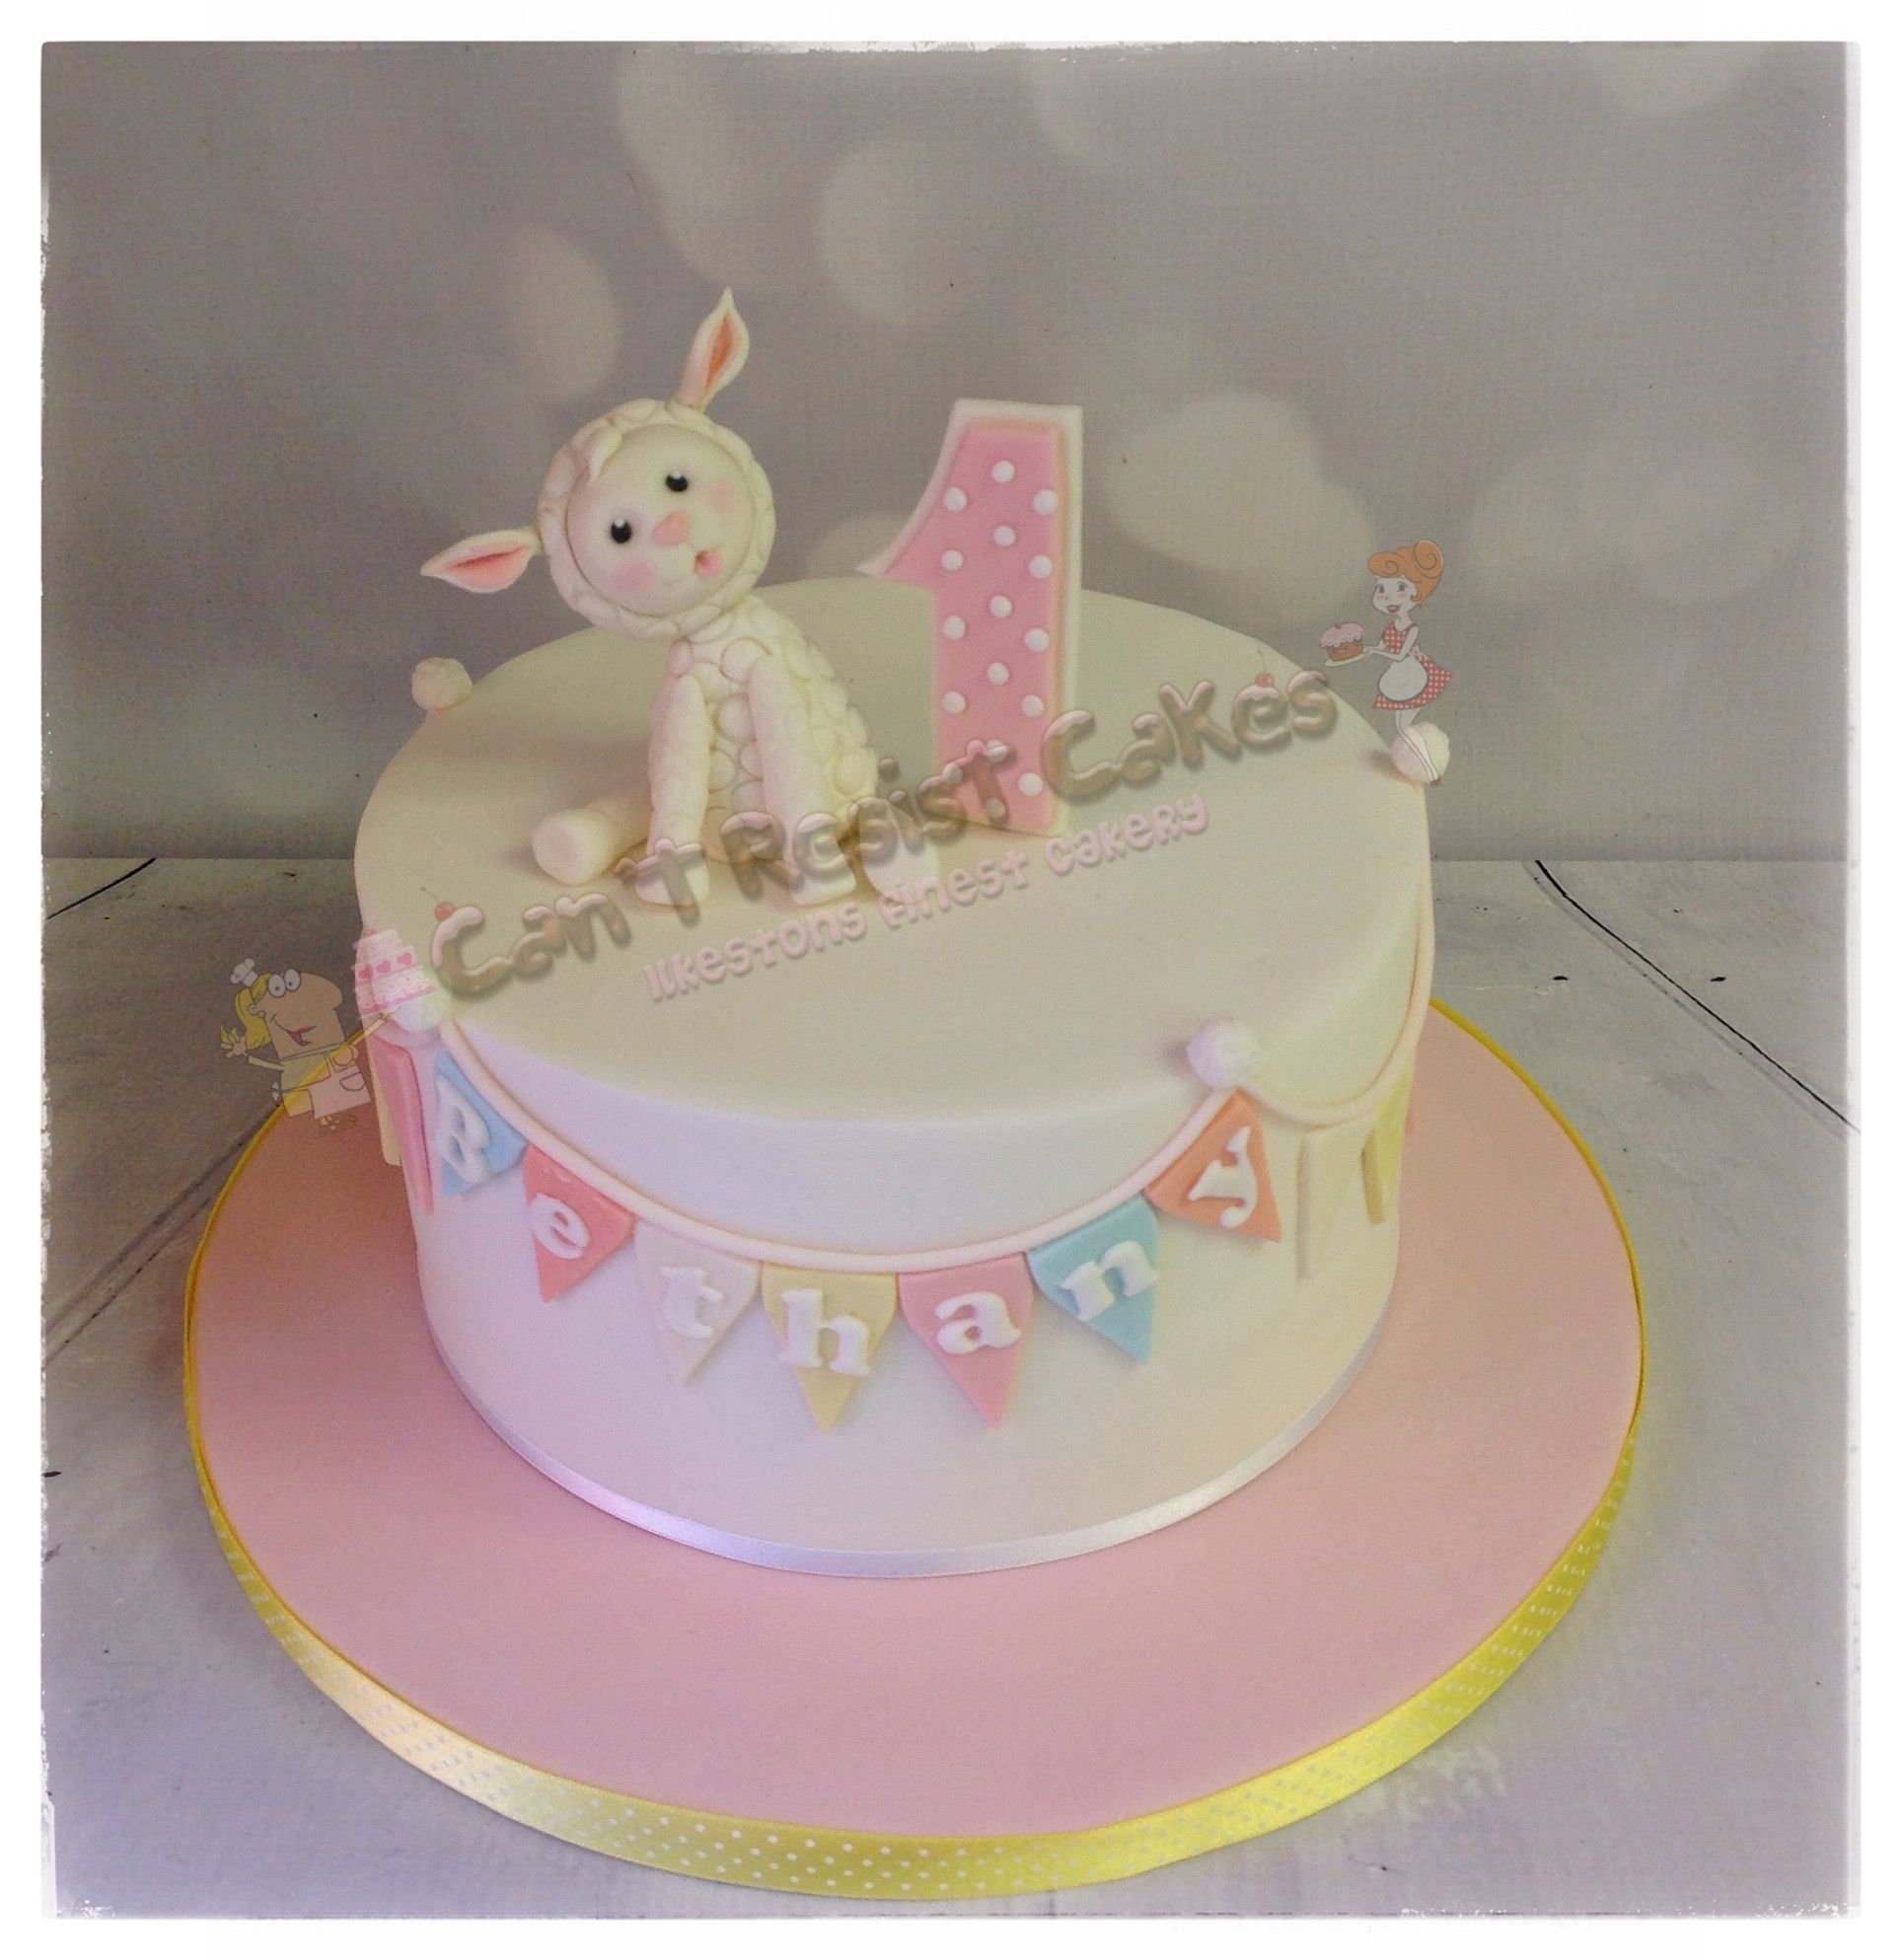 Enjoyable Cute Lamb 1St Birthday Cake With Images 1St Birthday Cake Birthday Cards Printable Inklcafe Filternl